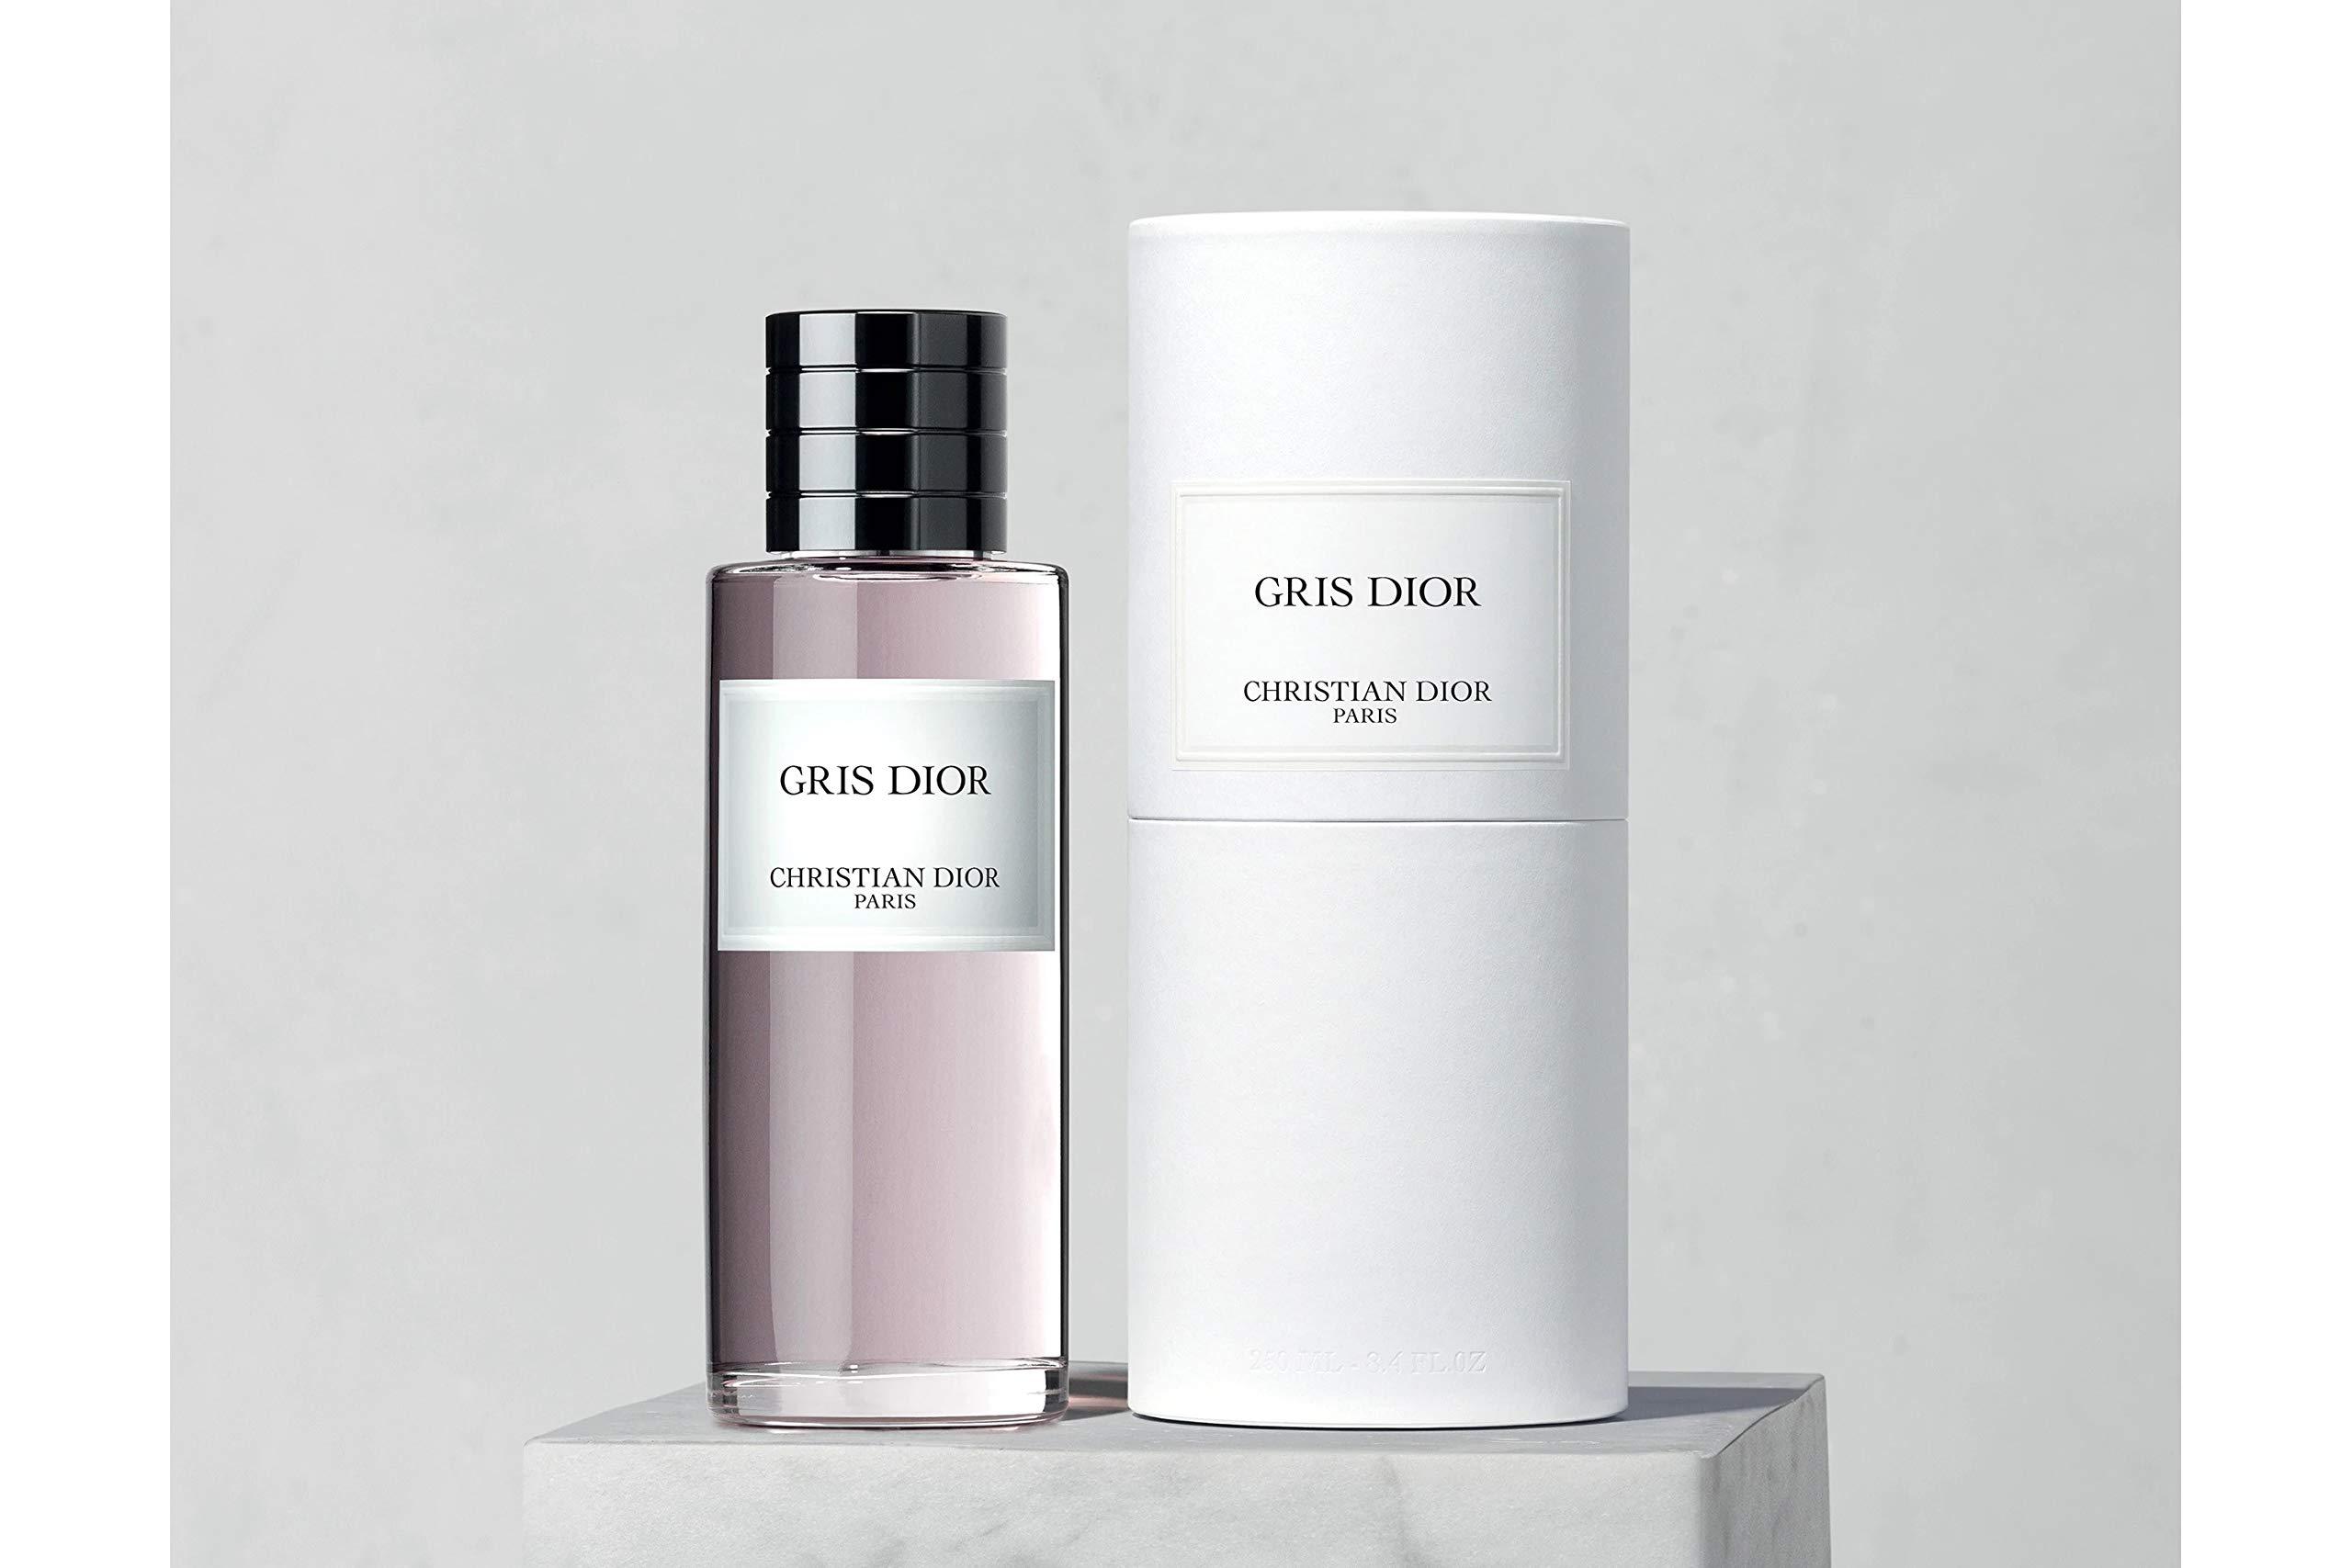 GRIS DIOR (GRIS MONTAIGNE) by CHRISTIAN DIOR 8.5oz/250ml